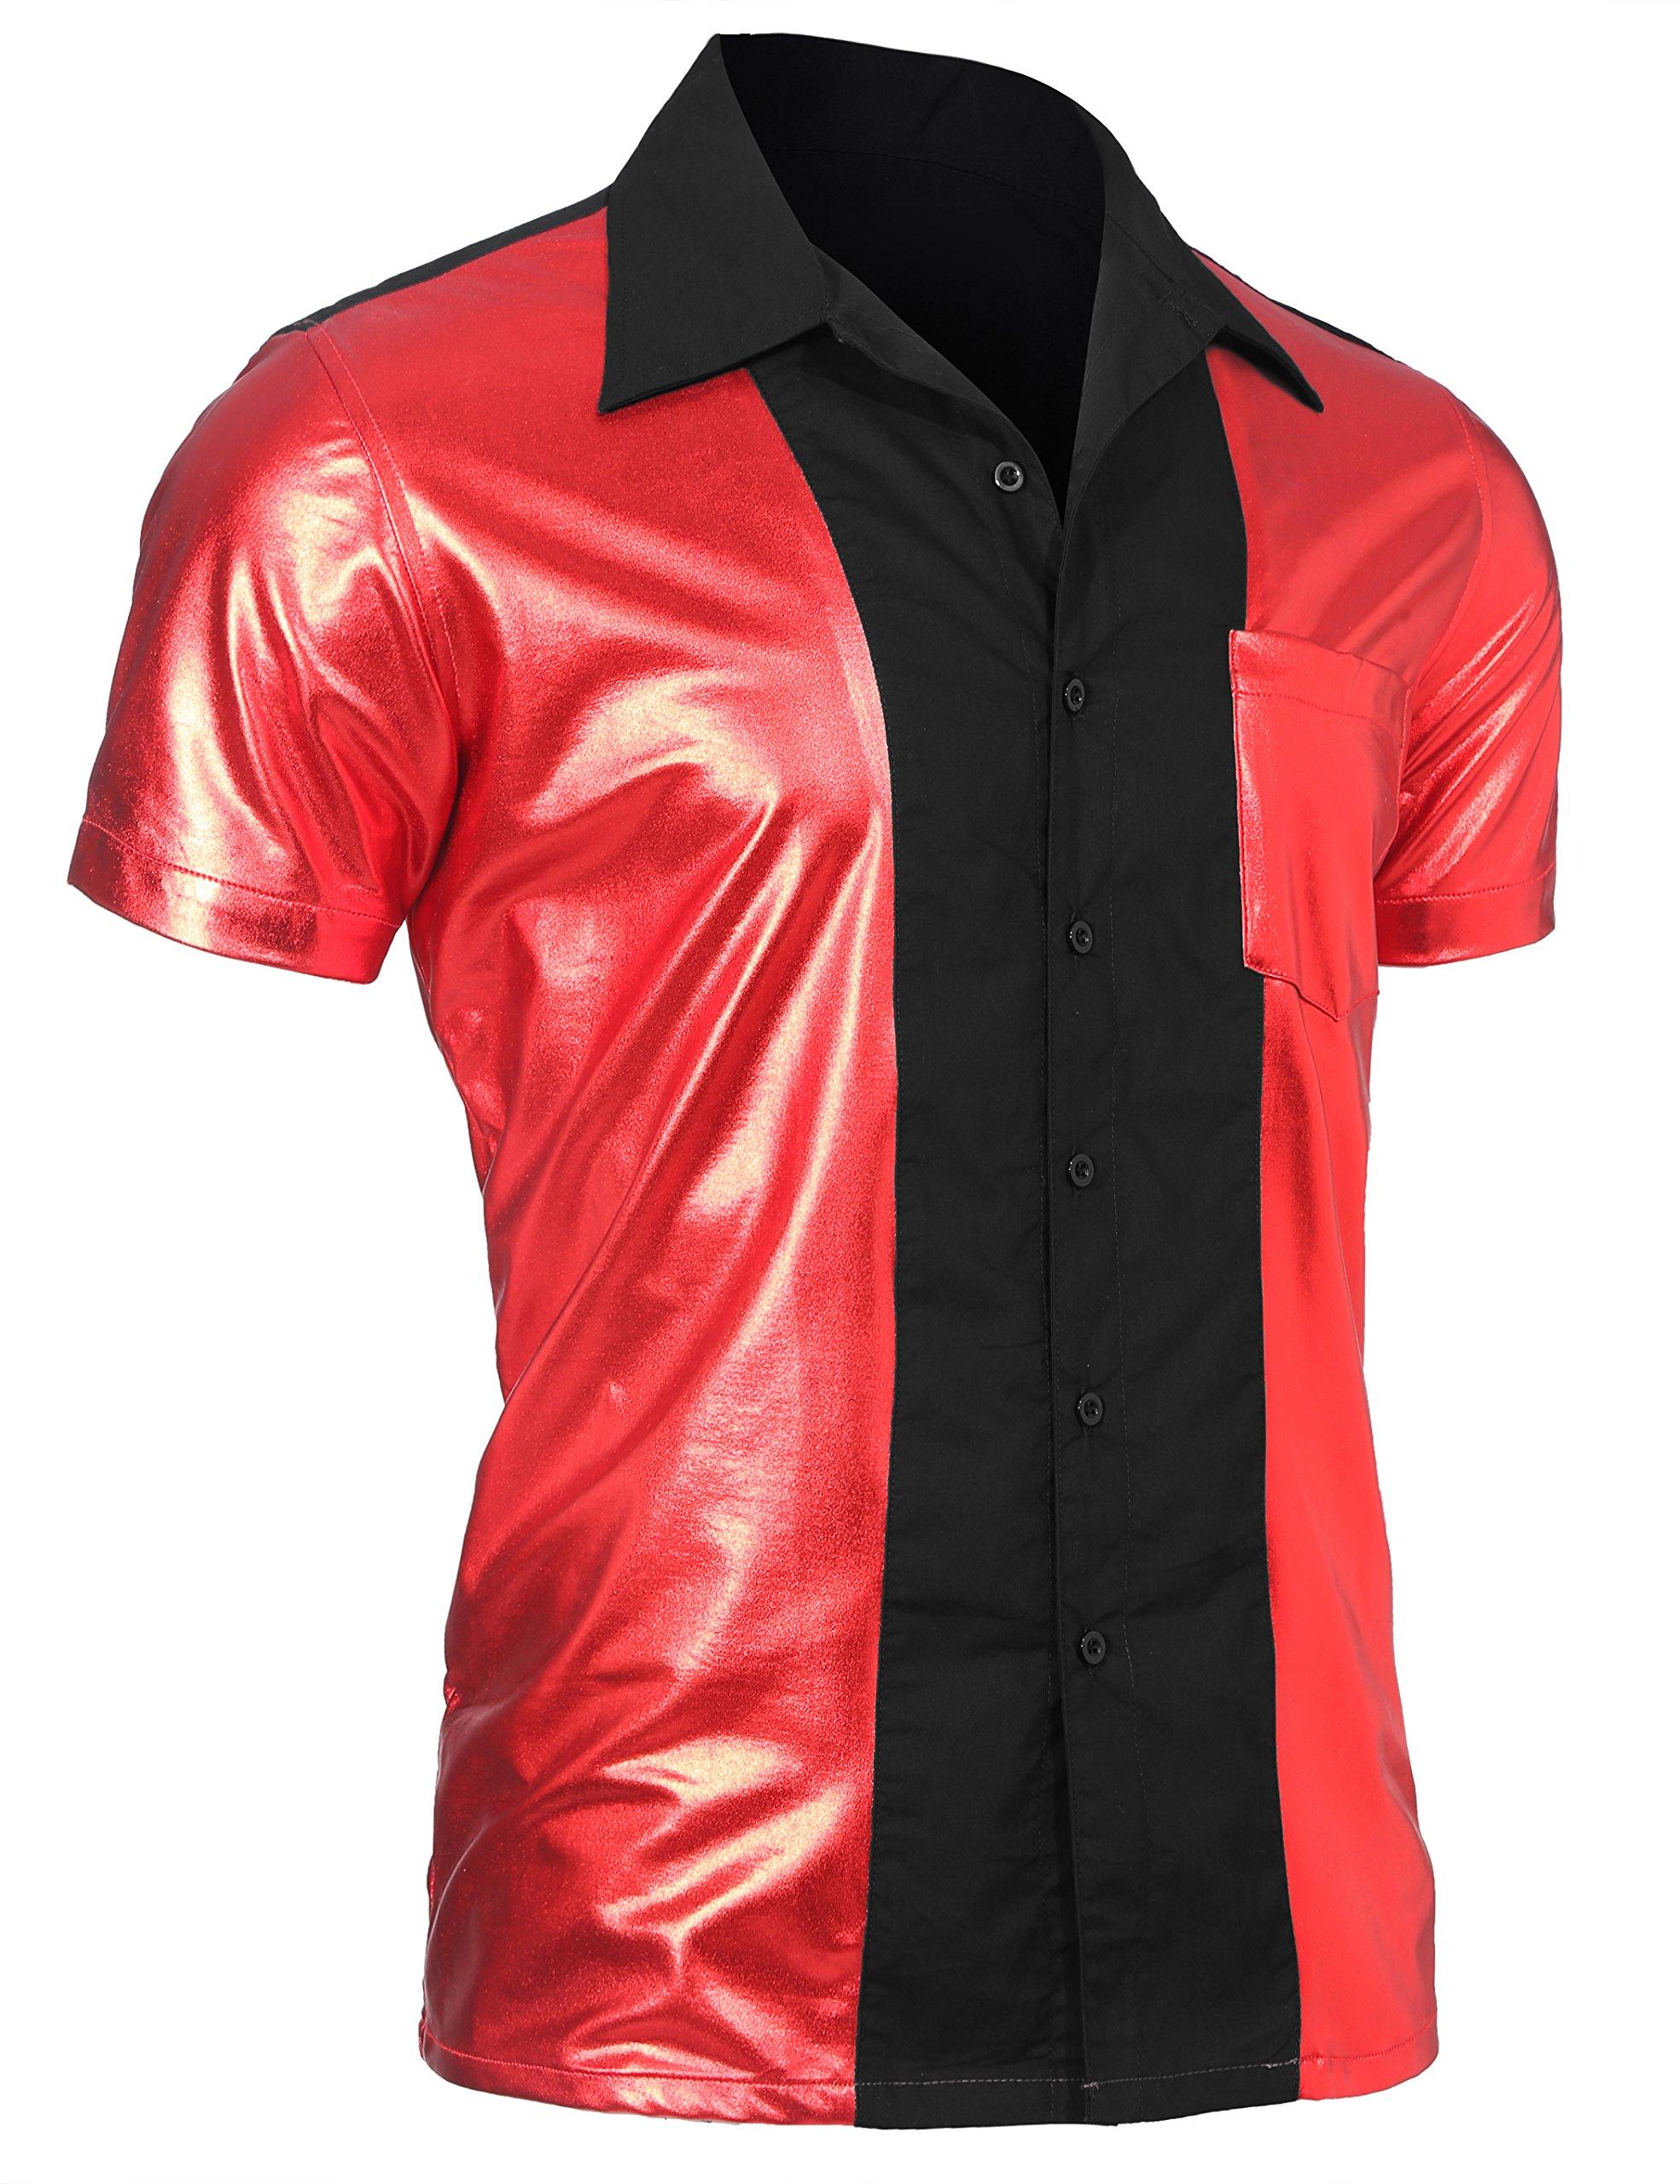 JINIDU Men's Party Shirt Shiny Metallic Disco Nightclub Style Halloween Short Sleeves Button Down Bowling Shirts